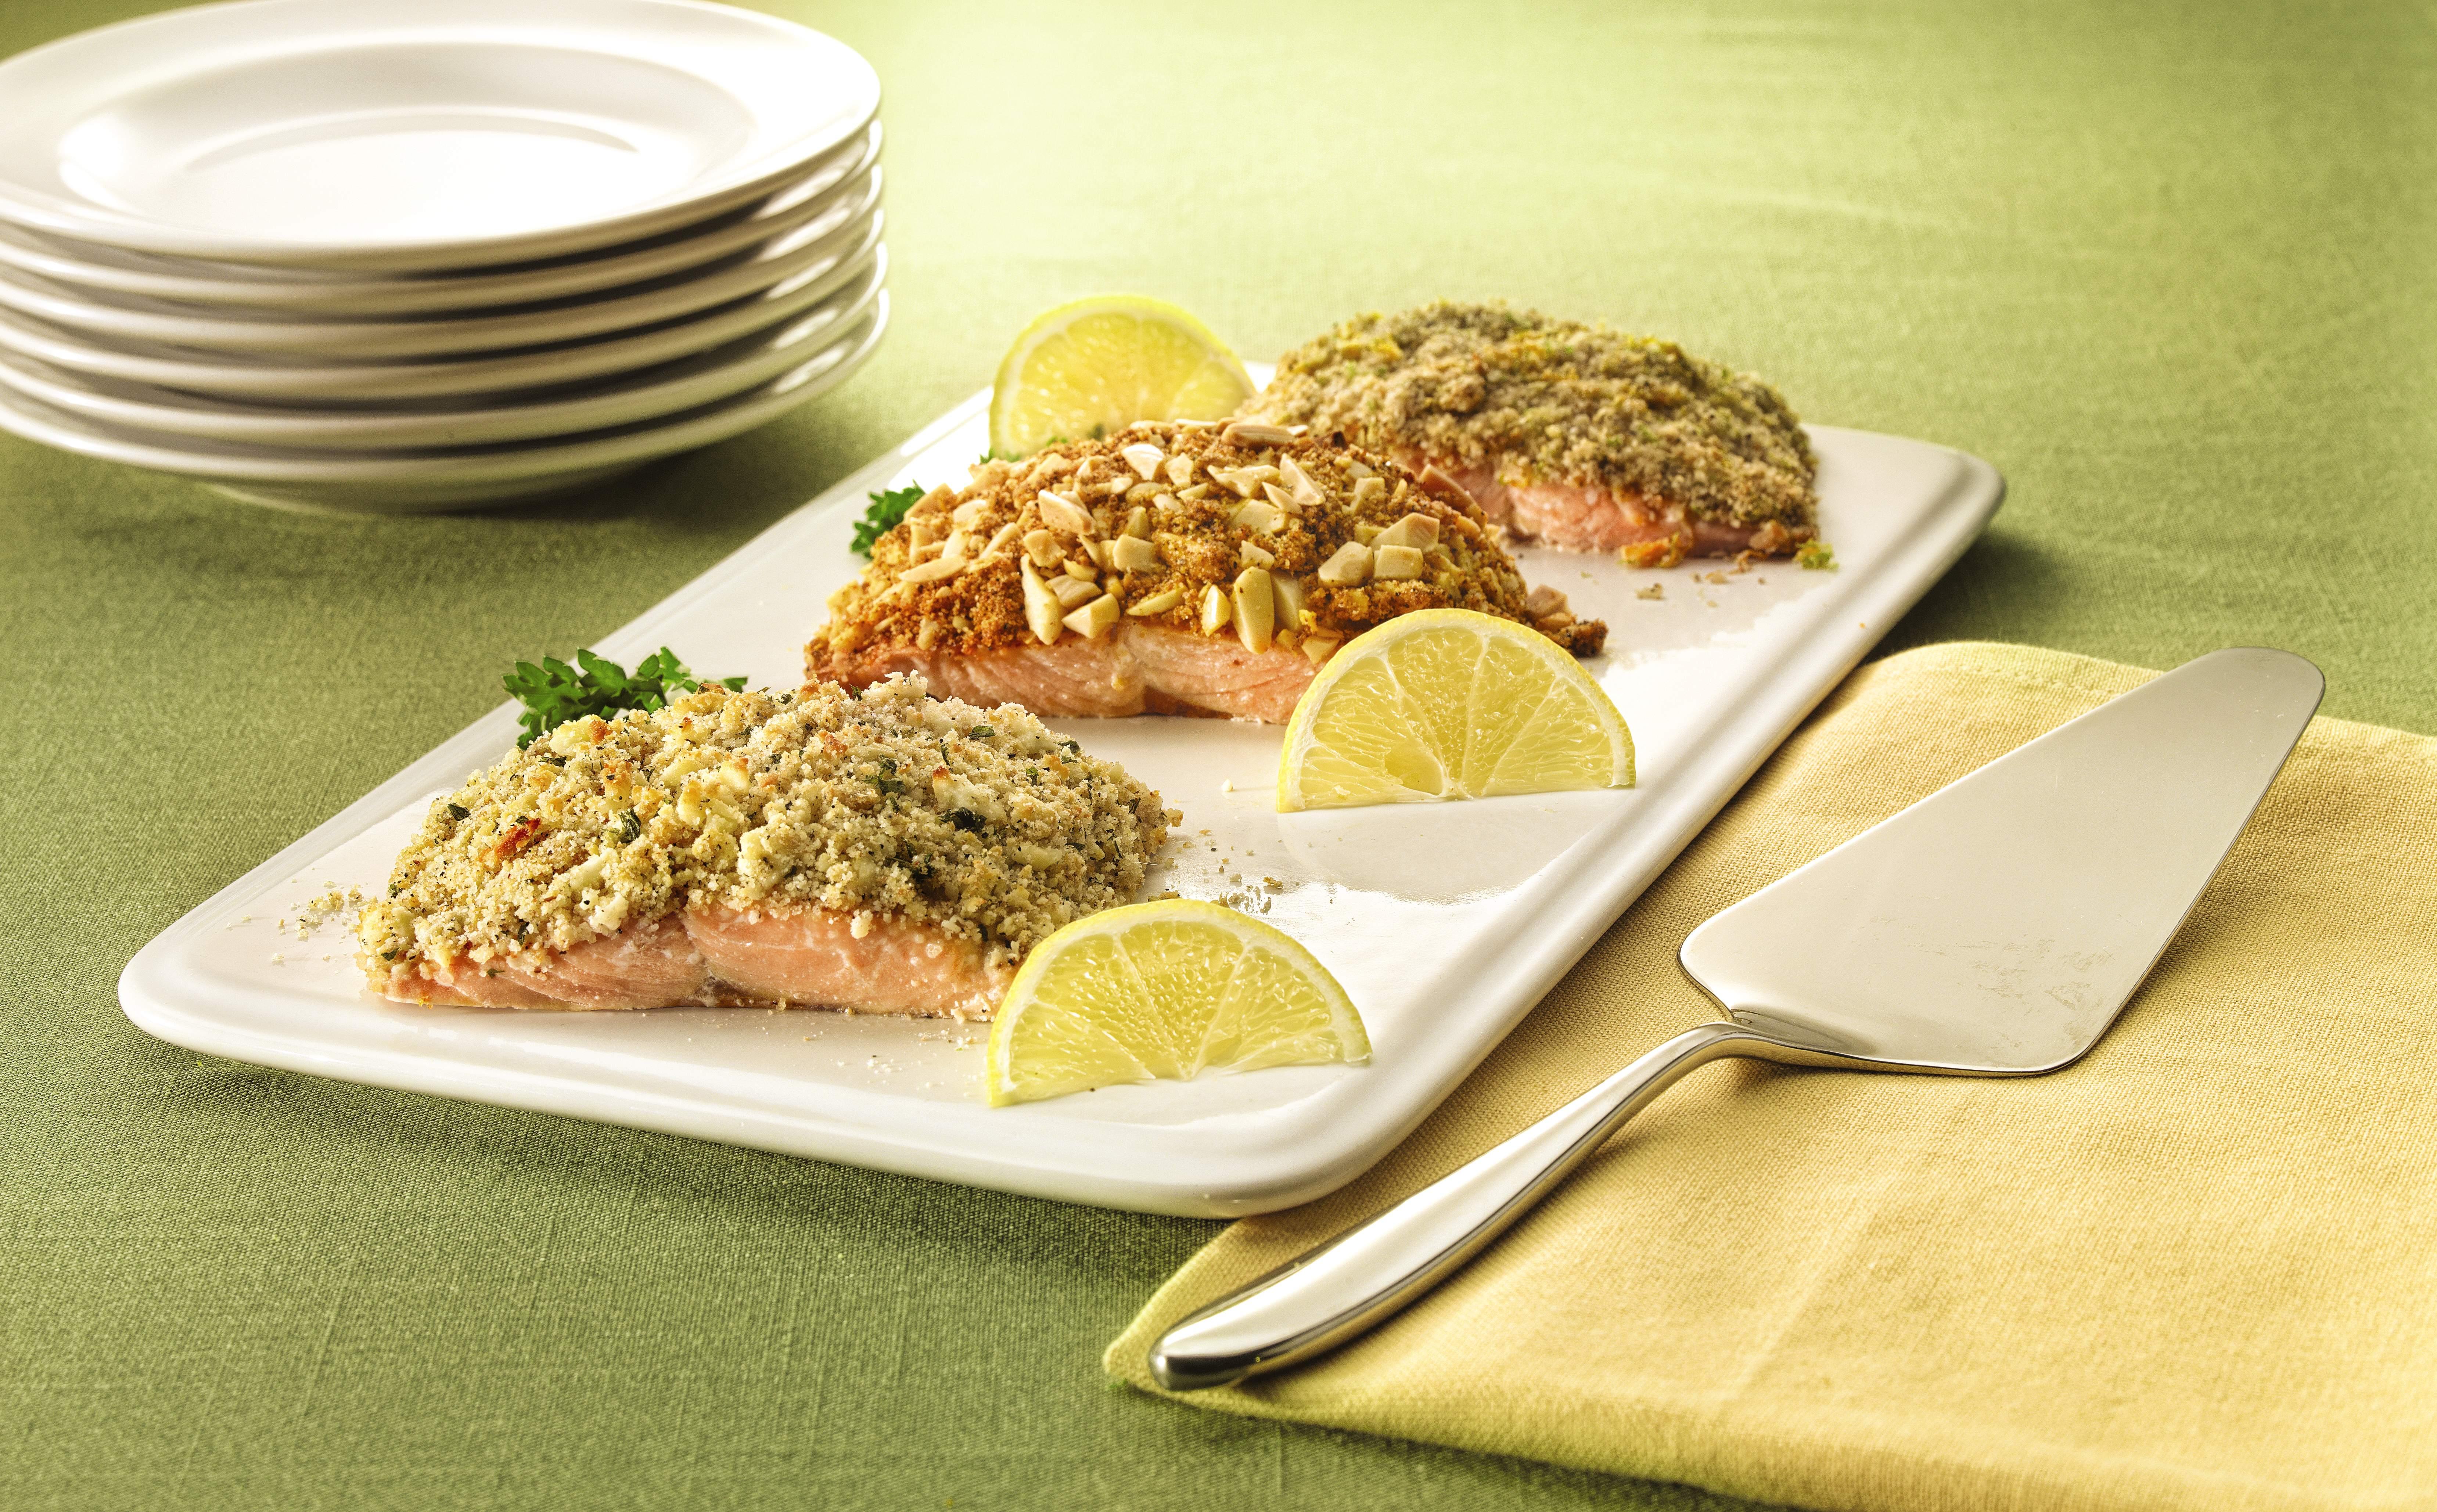 Crusted salmon with lemon and parsley garnish.